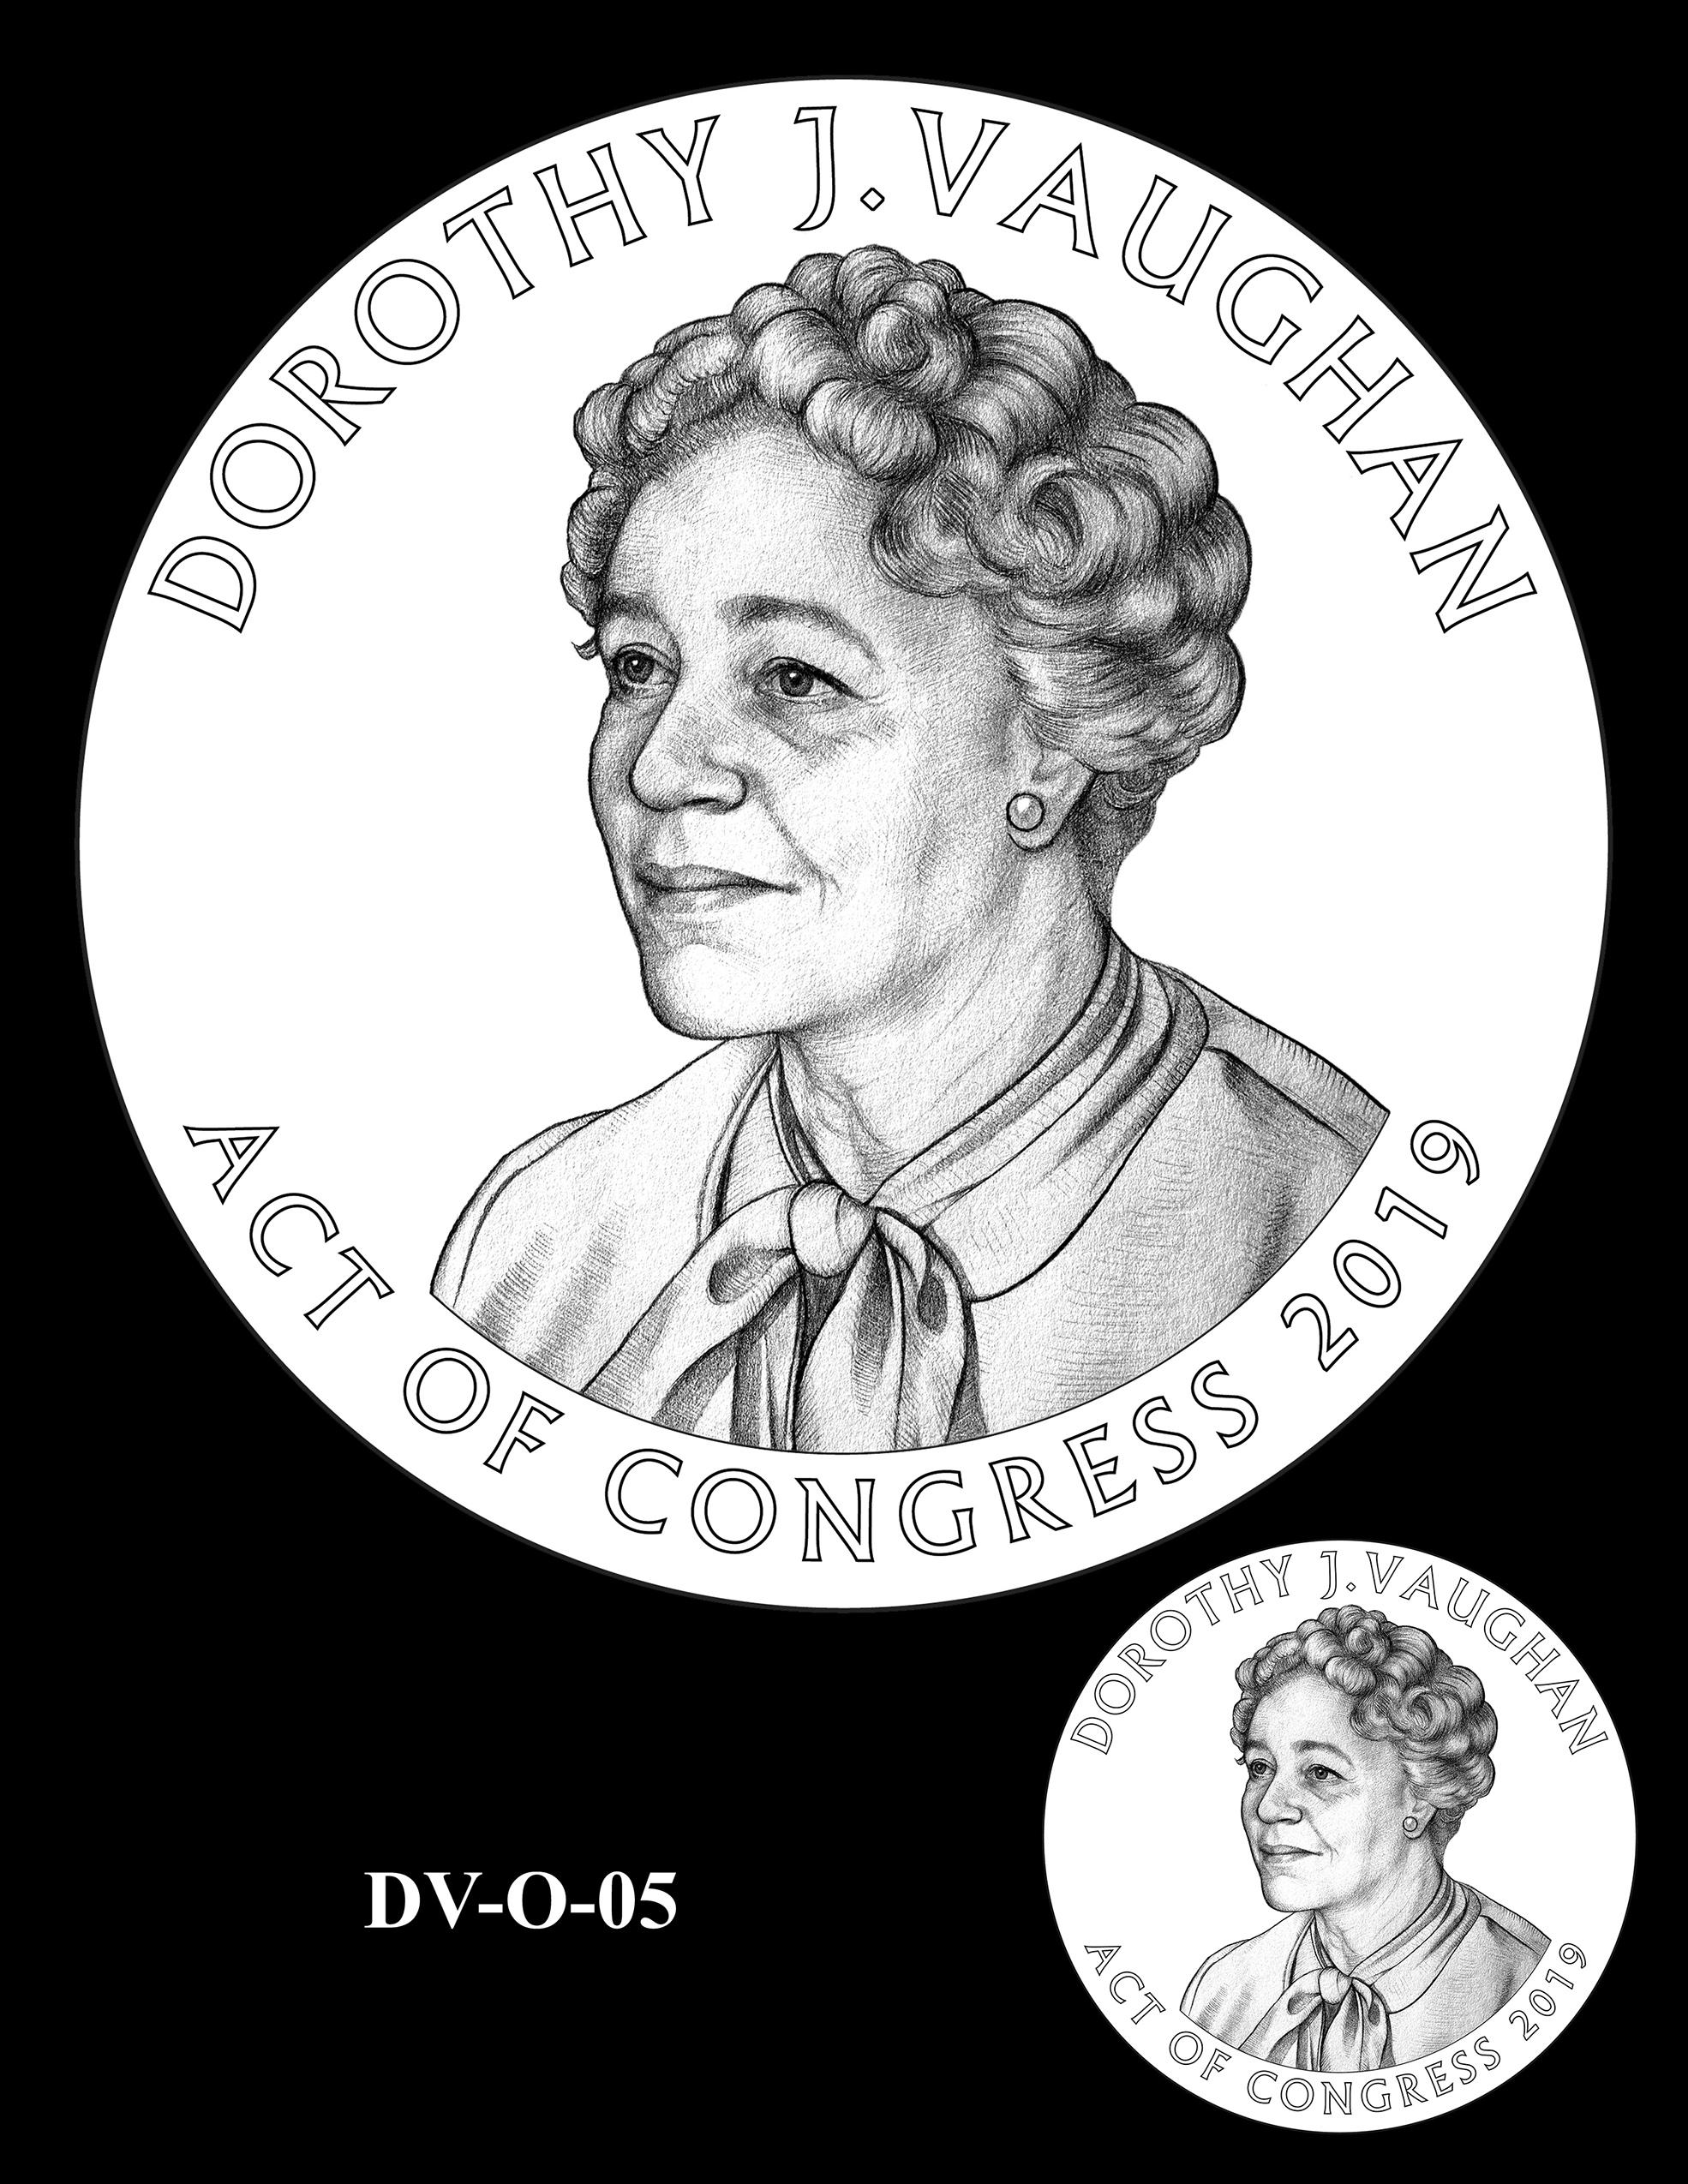 DV-O-05 -- Dorothy J. Vaughan Congressional Gold Medal